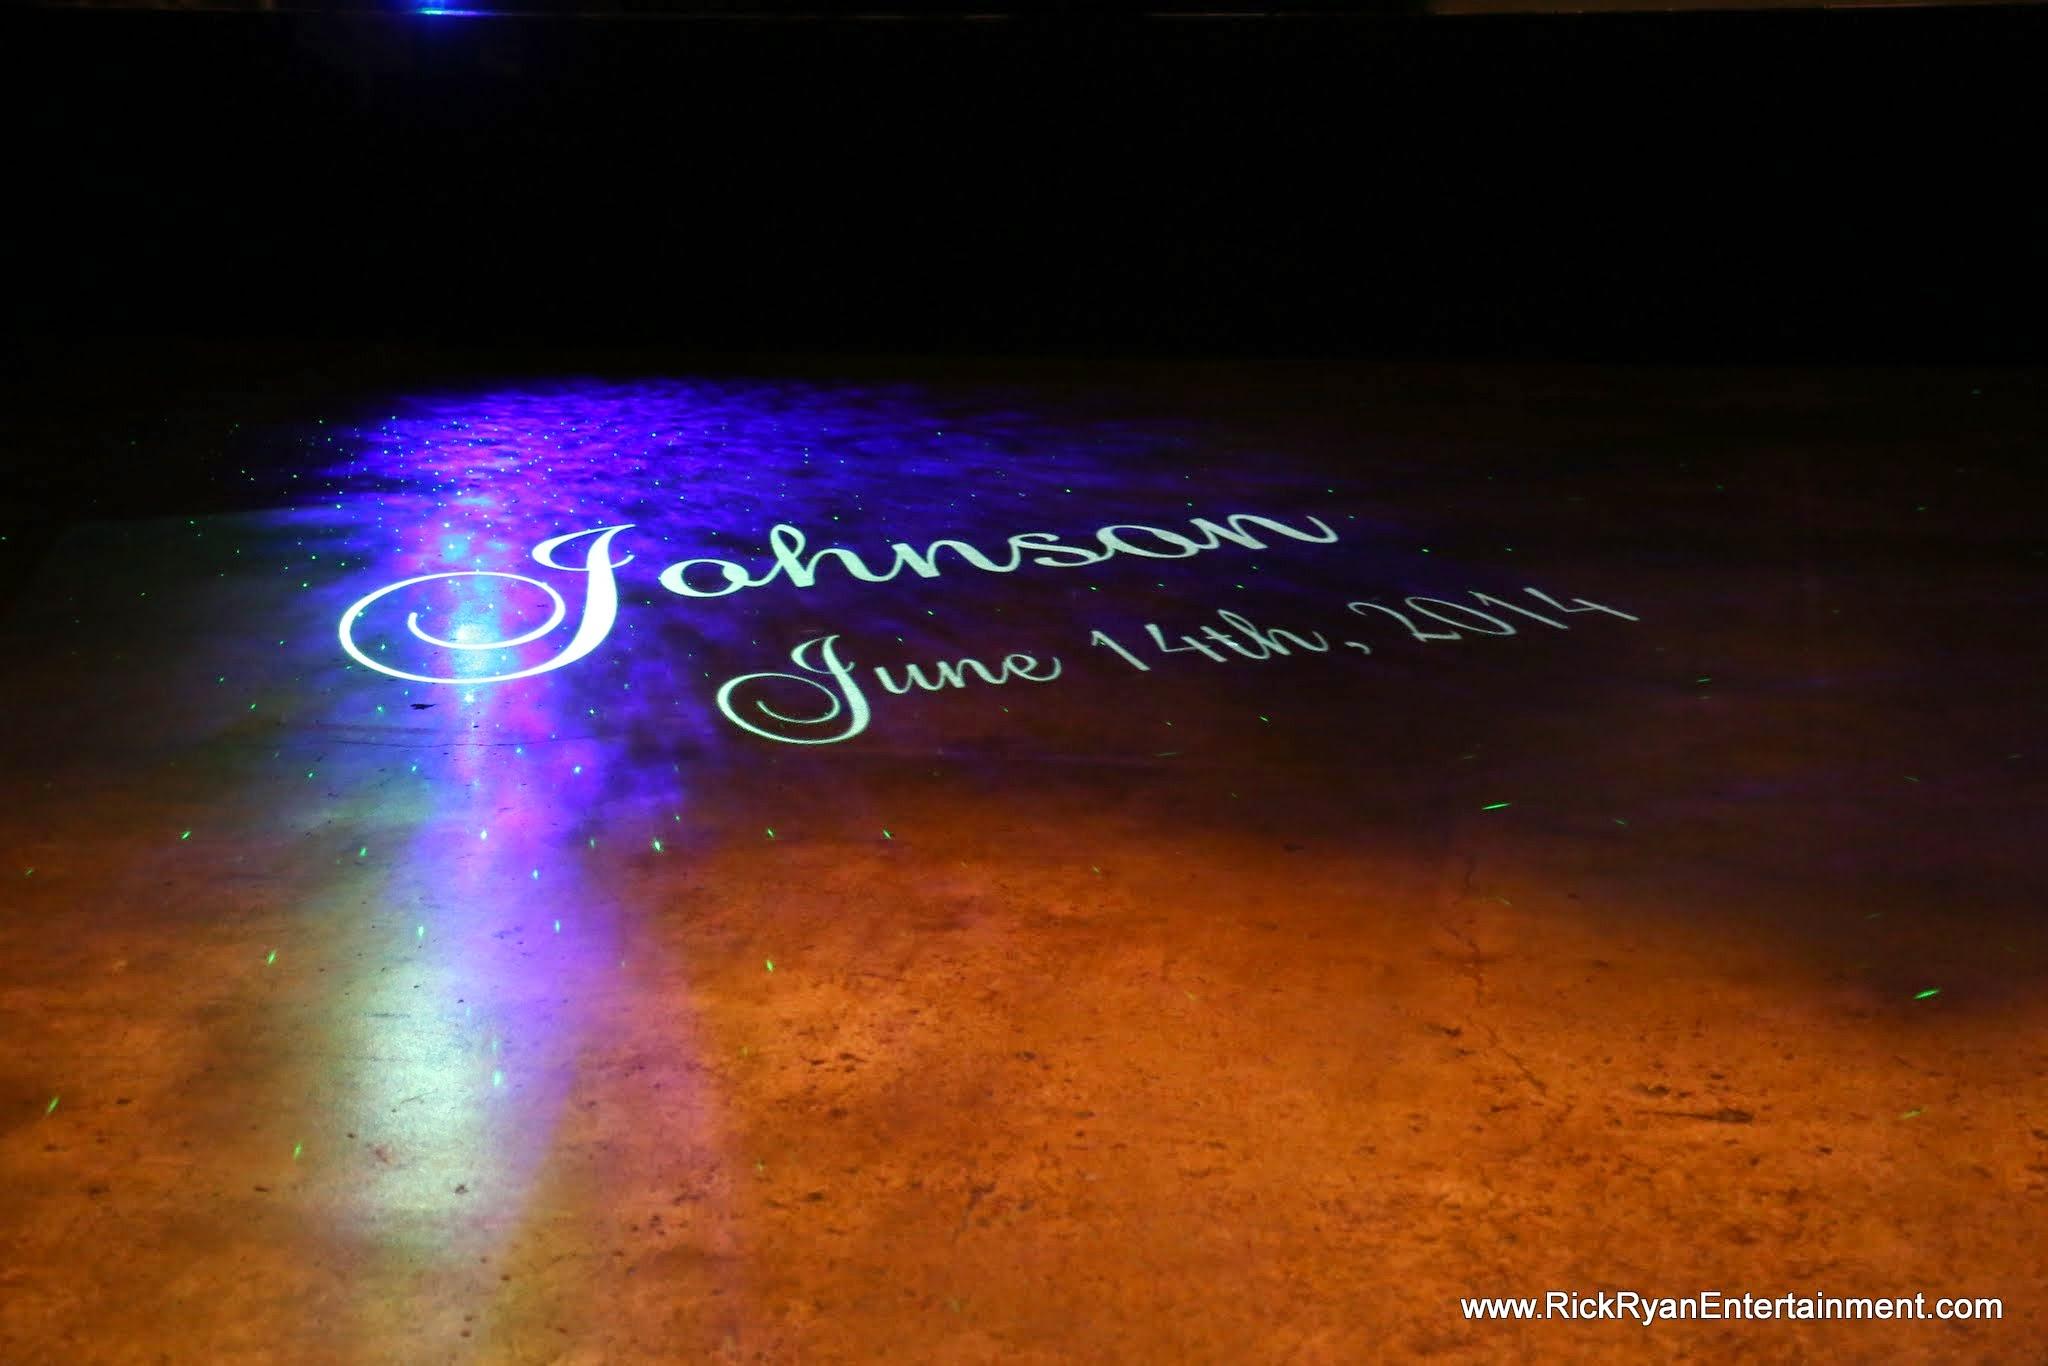 Nashville_Franklin_RickRyan_Wedding_DJ_Disc_Jockey_Lighting_Photobooth (4).JPG